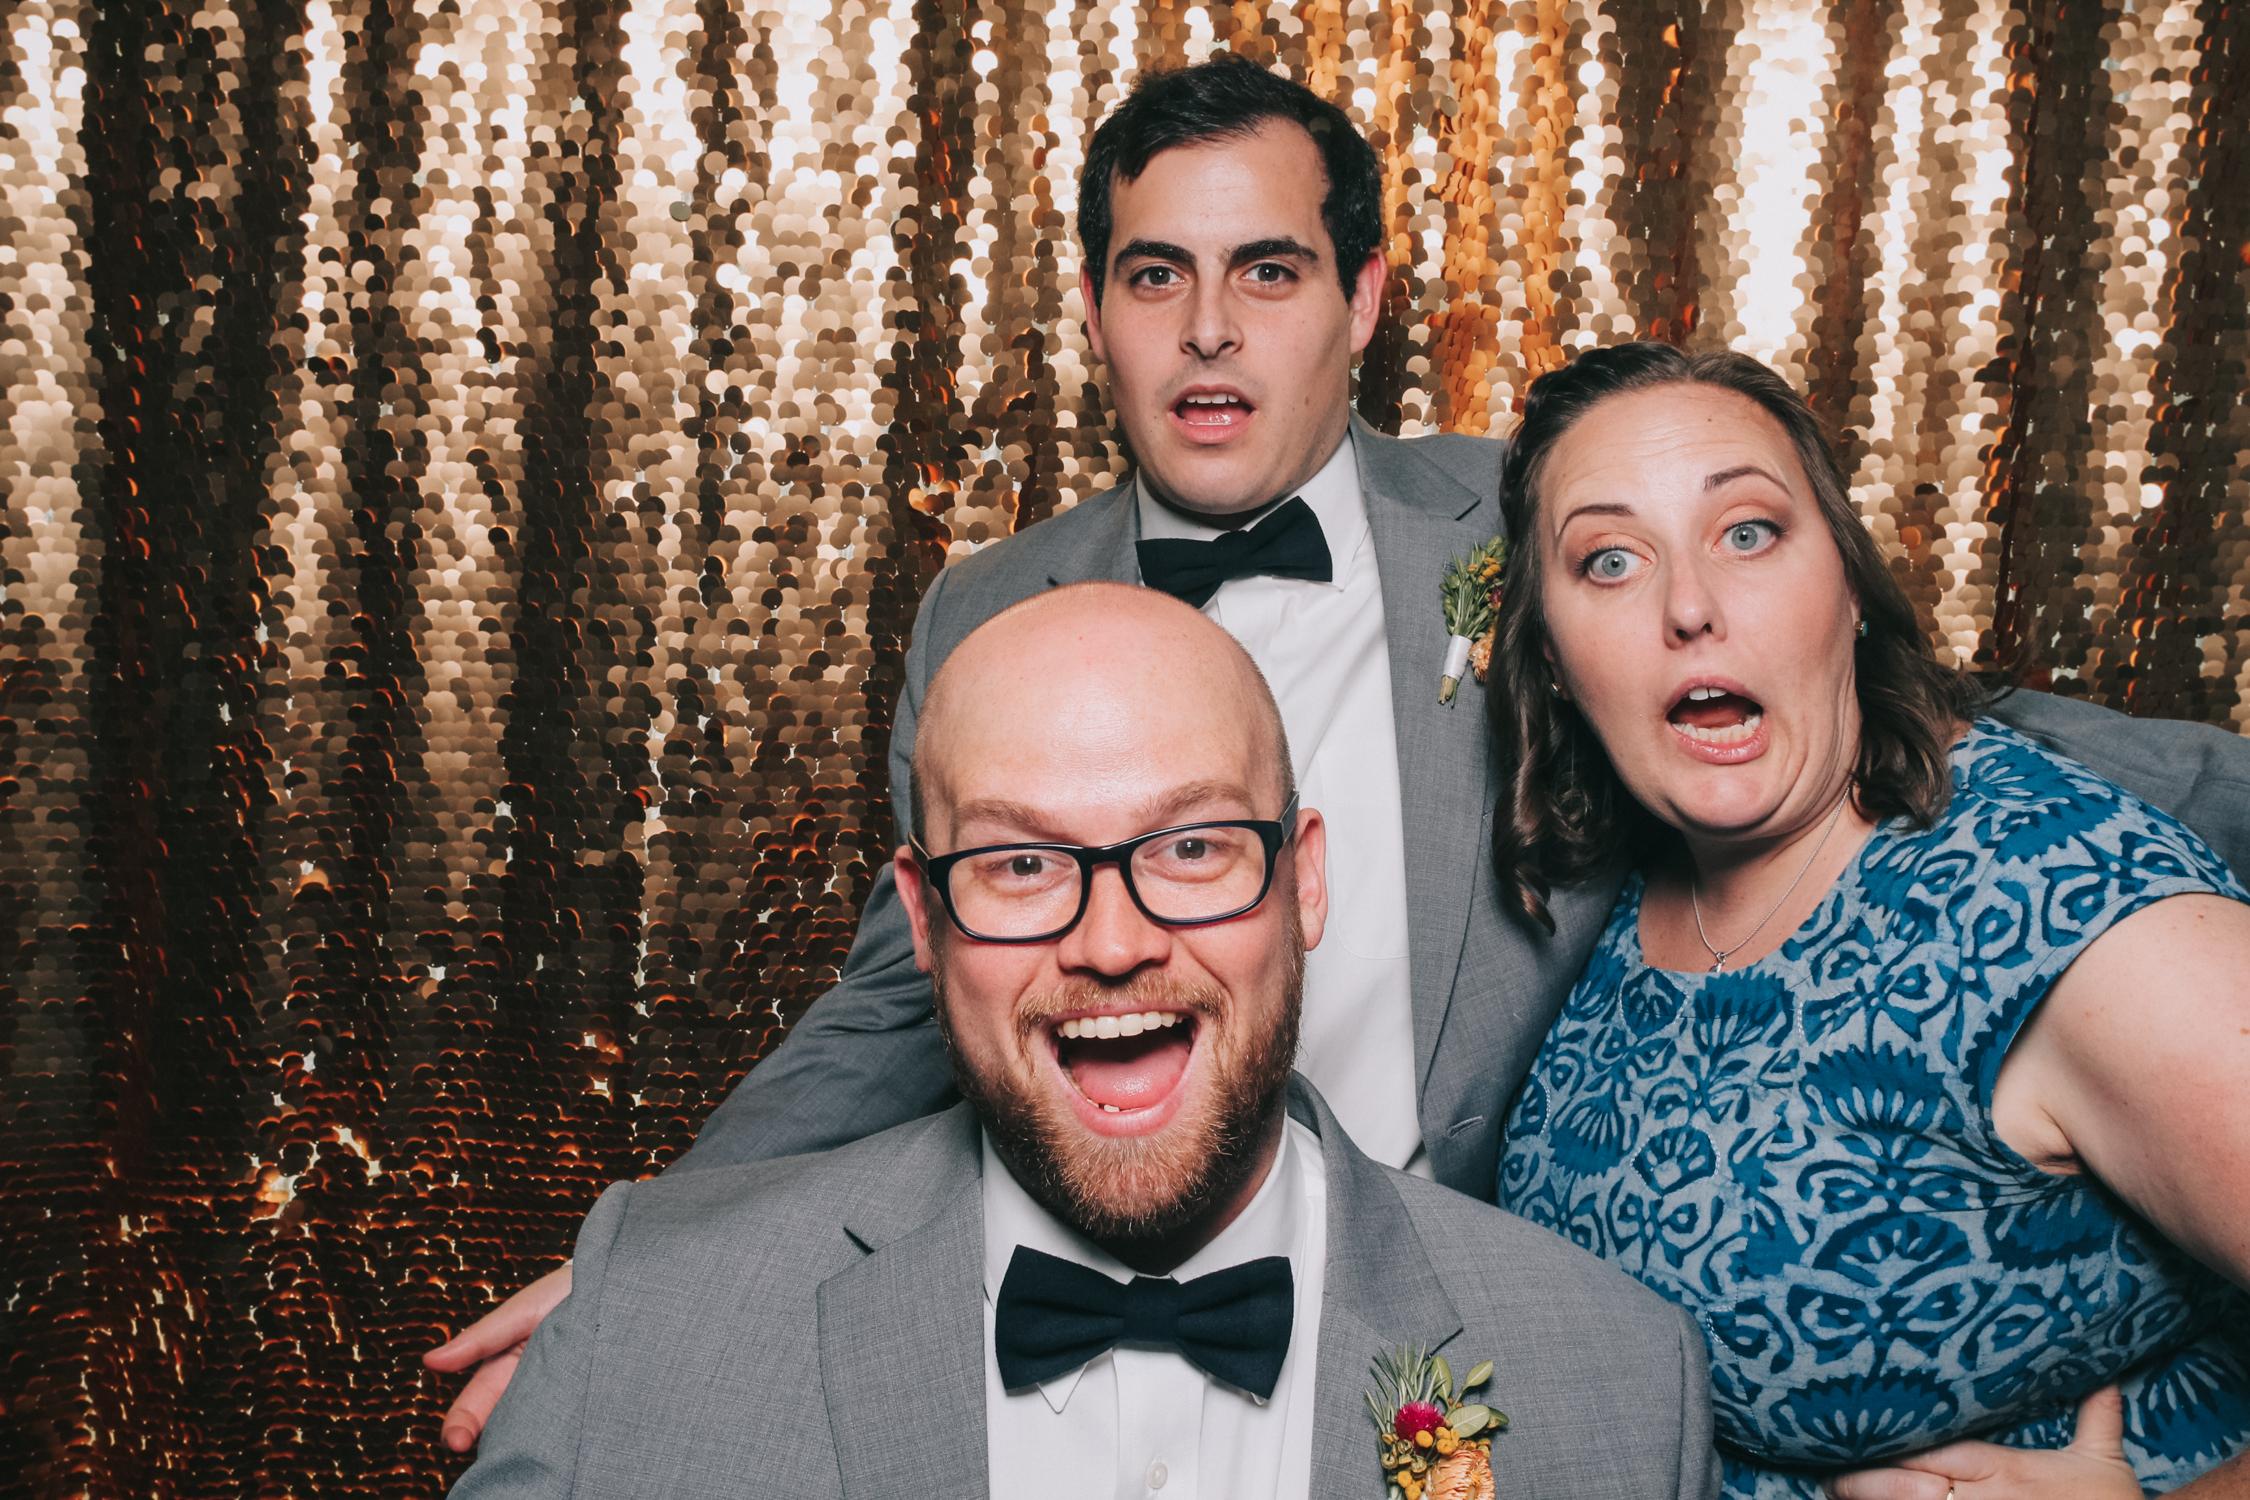 baltimore rusty scupper wedding photo booth-12.jpg